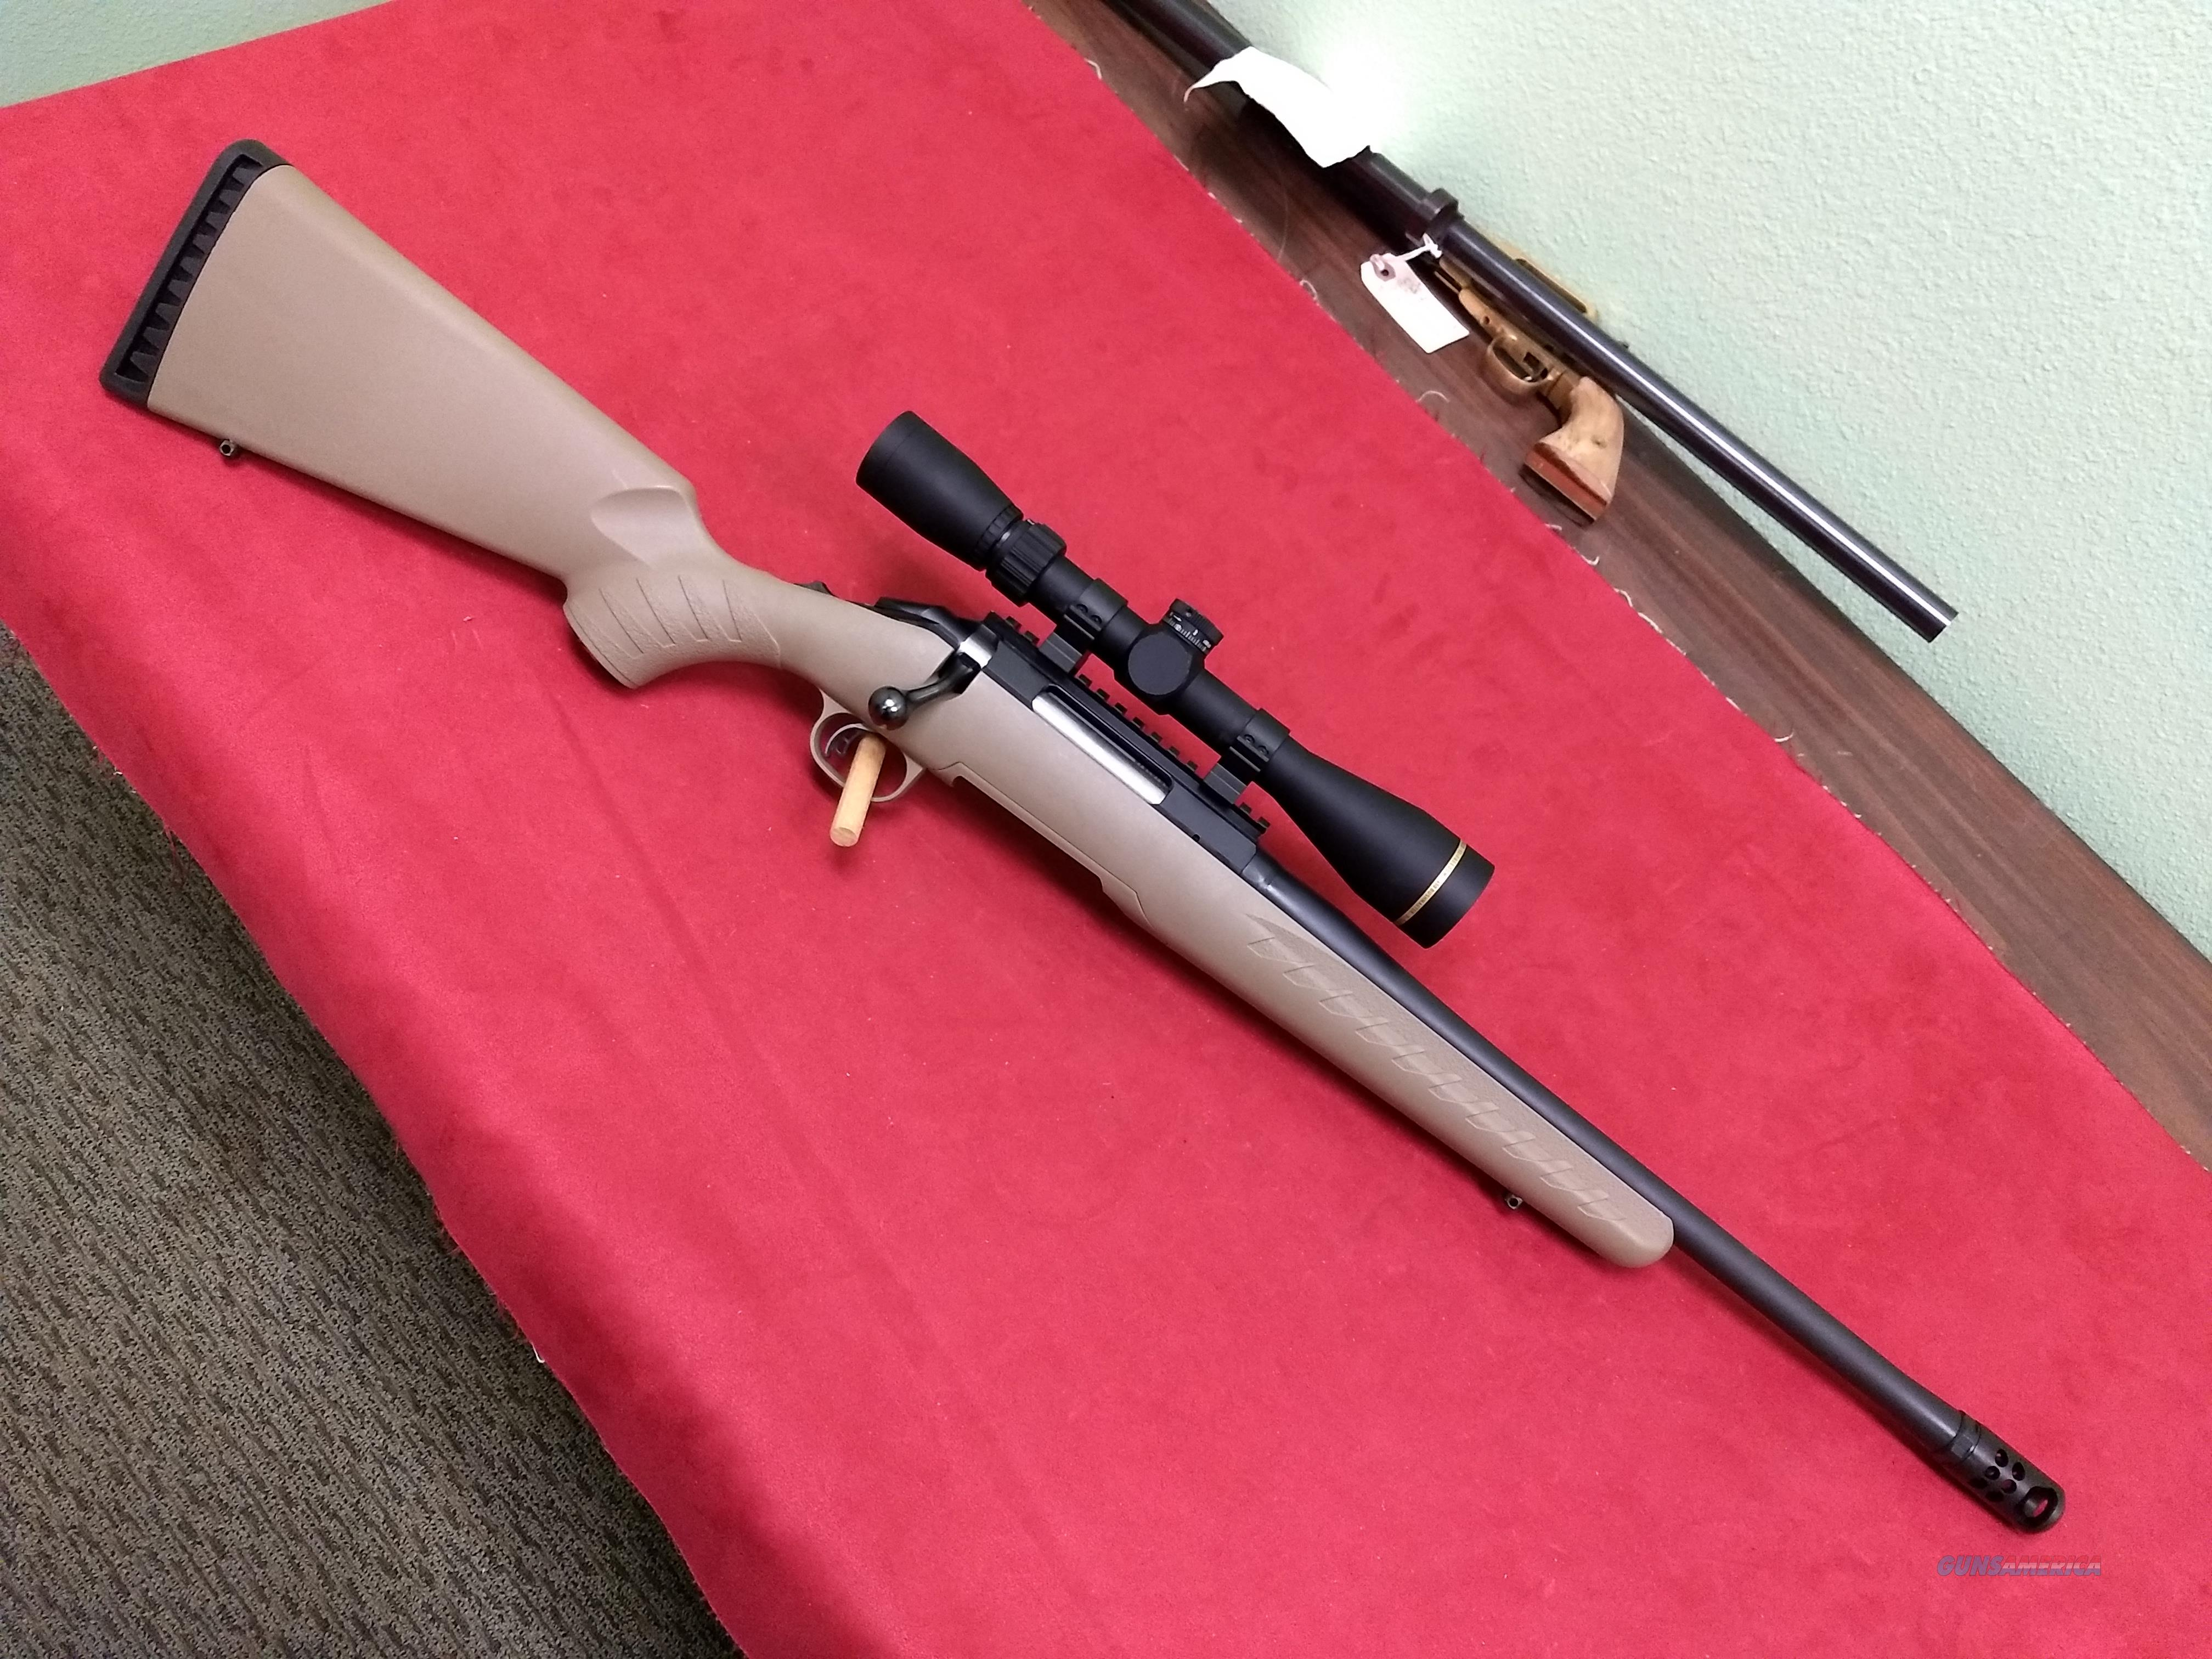 8aea8ed1734b7 450 bushmaster Ruger ranch rifle for sale on GunsAmerica. Bu...